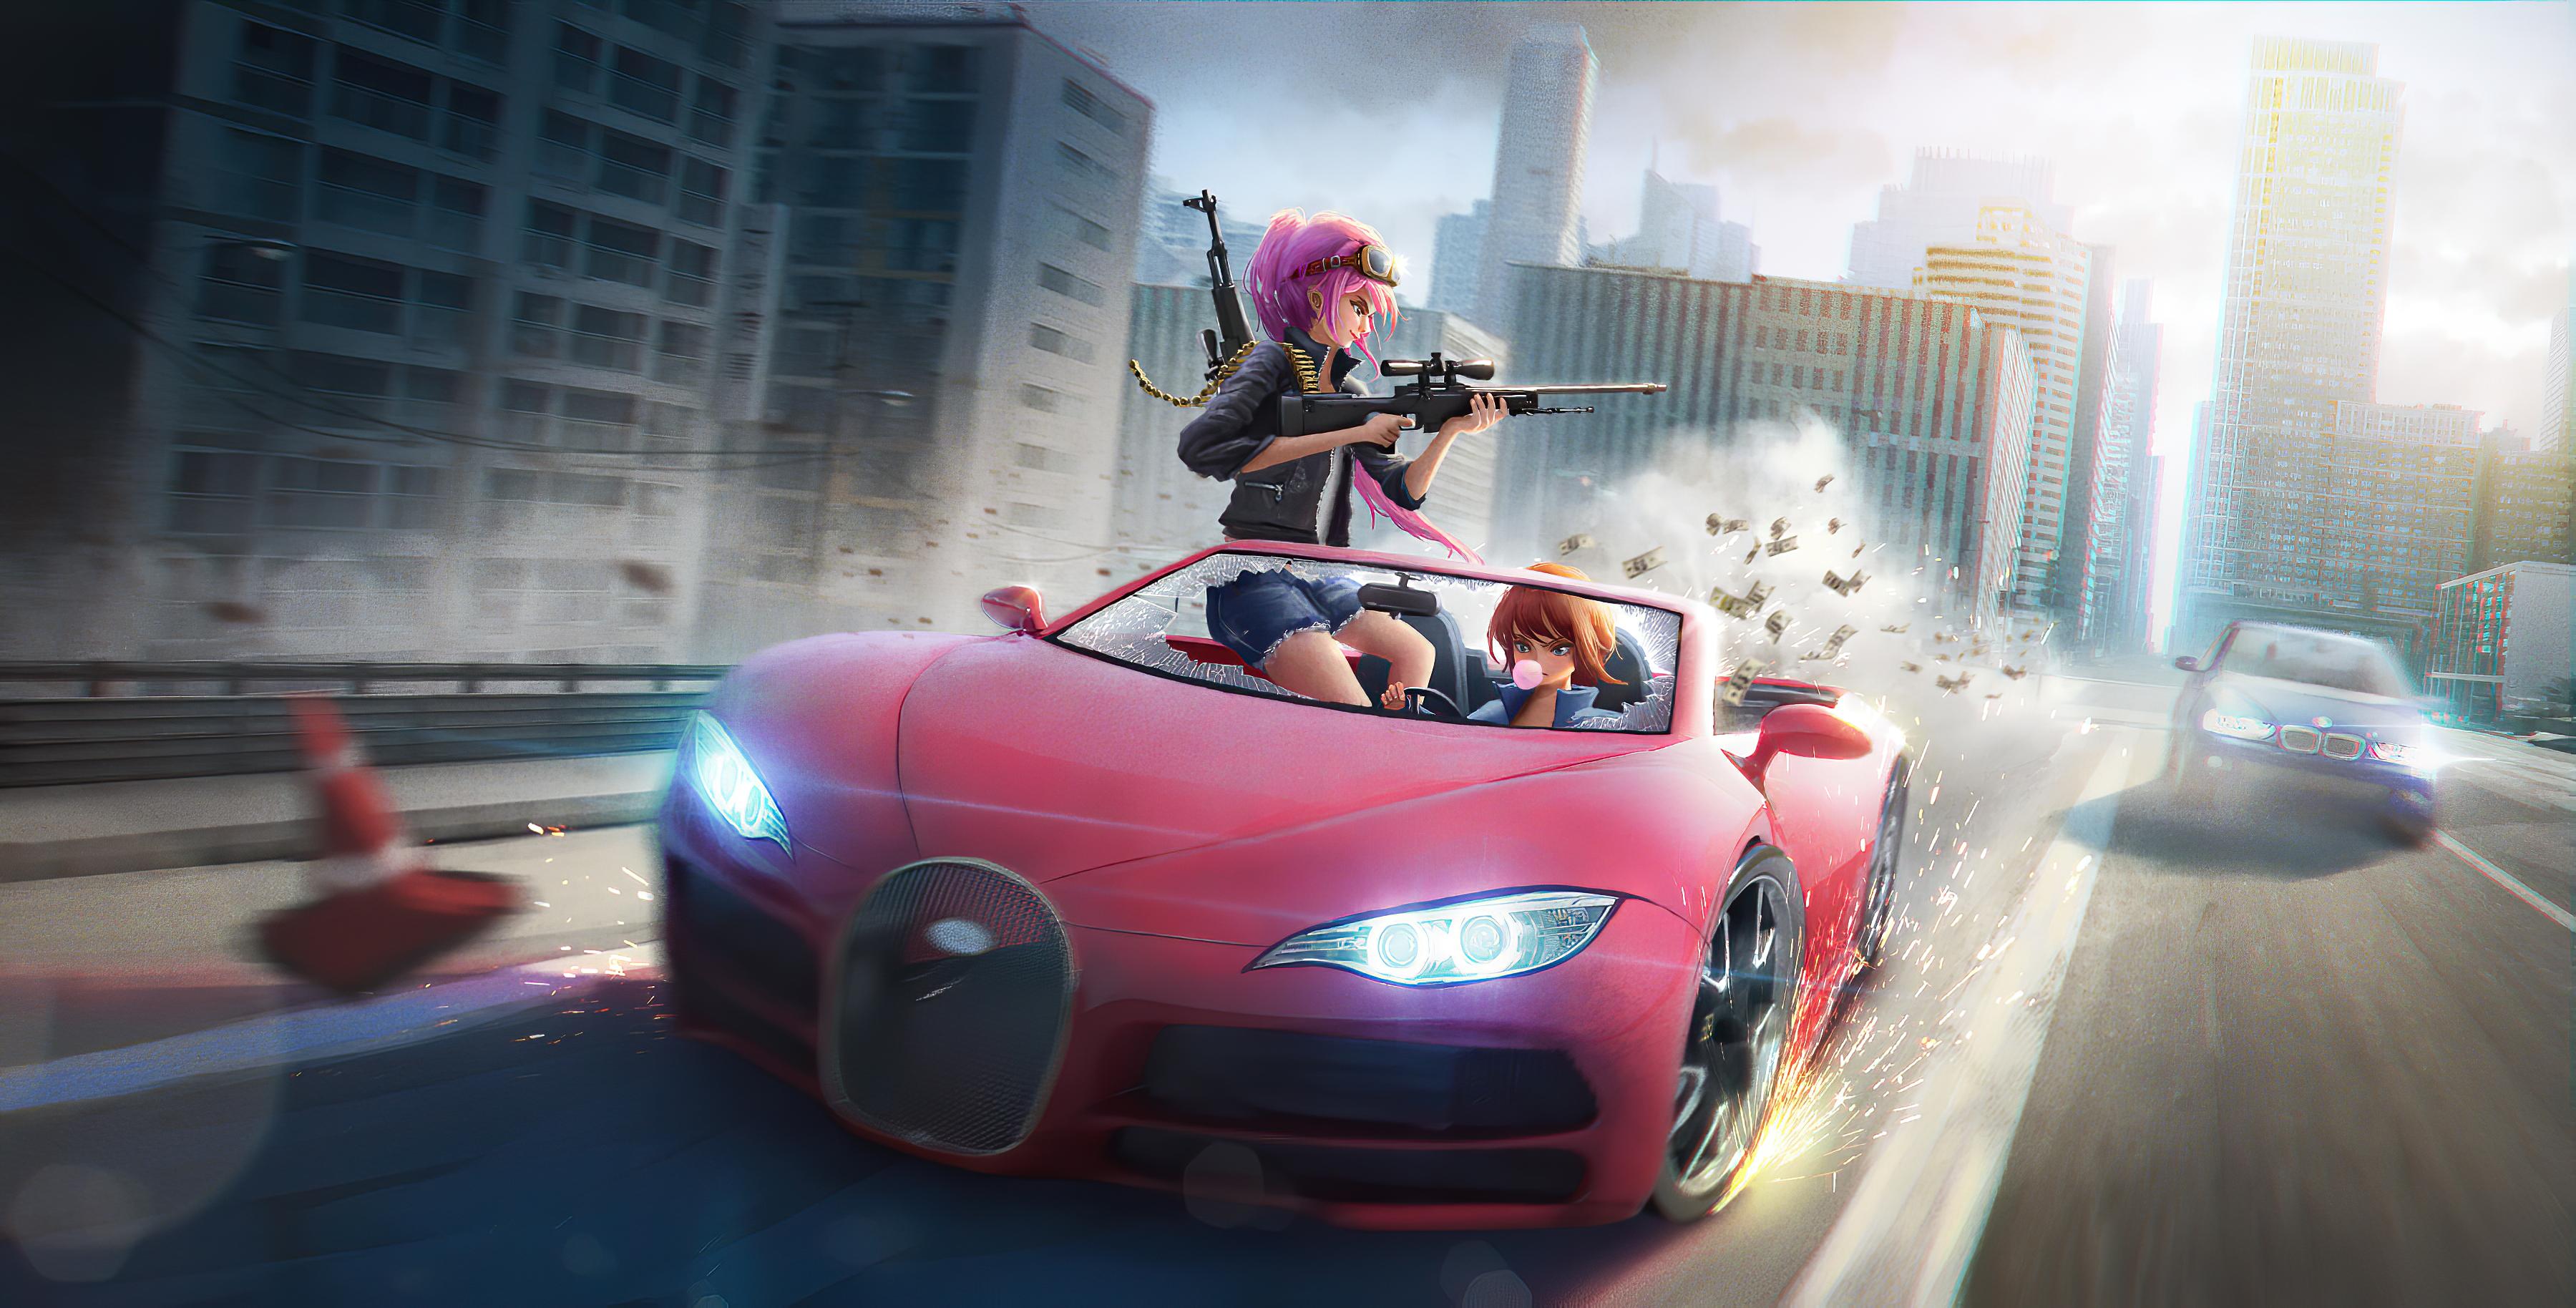 1920x1080 Anime Girls Car Chase 4k Laptop Full HD 1080P HD ...